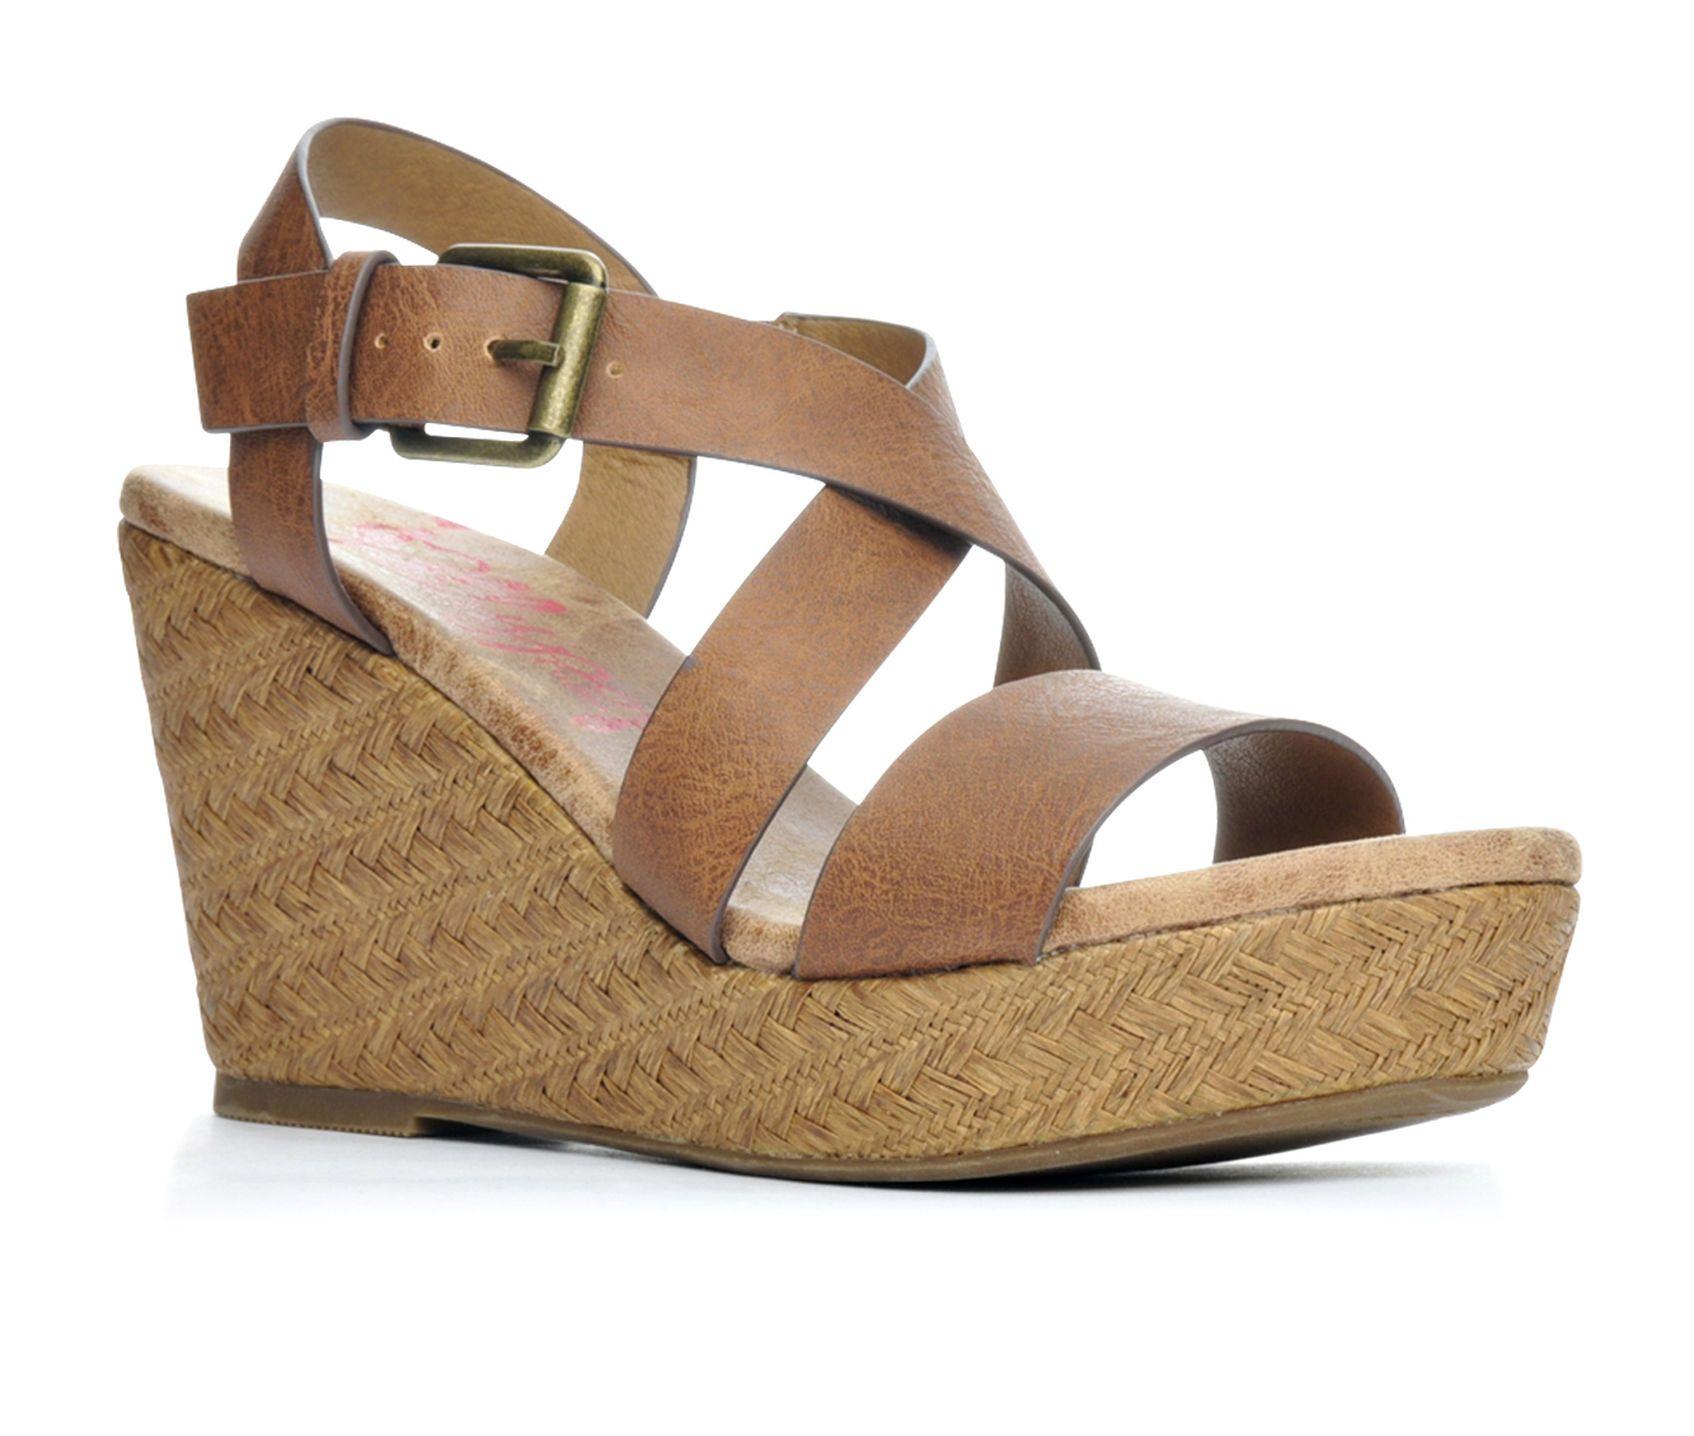 e93e8d9883a7 Women s Jellypop Tahoe Platform Wedge Sandals